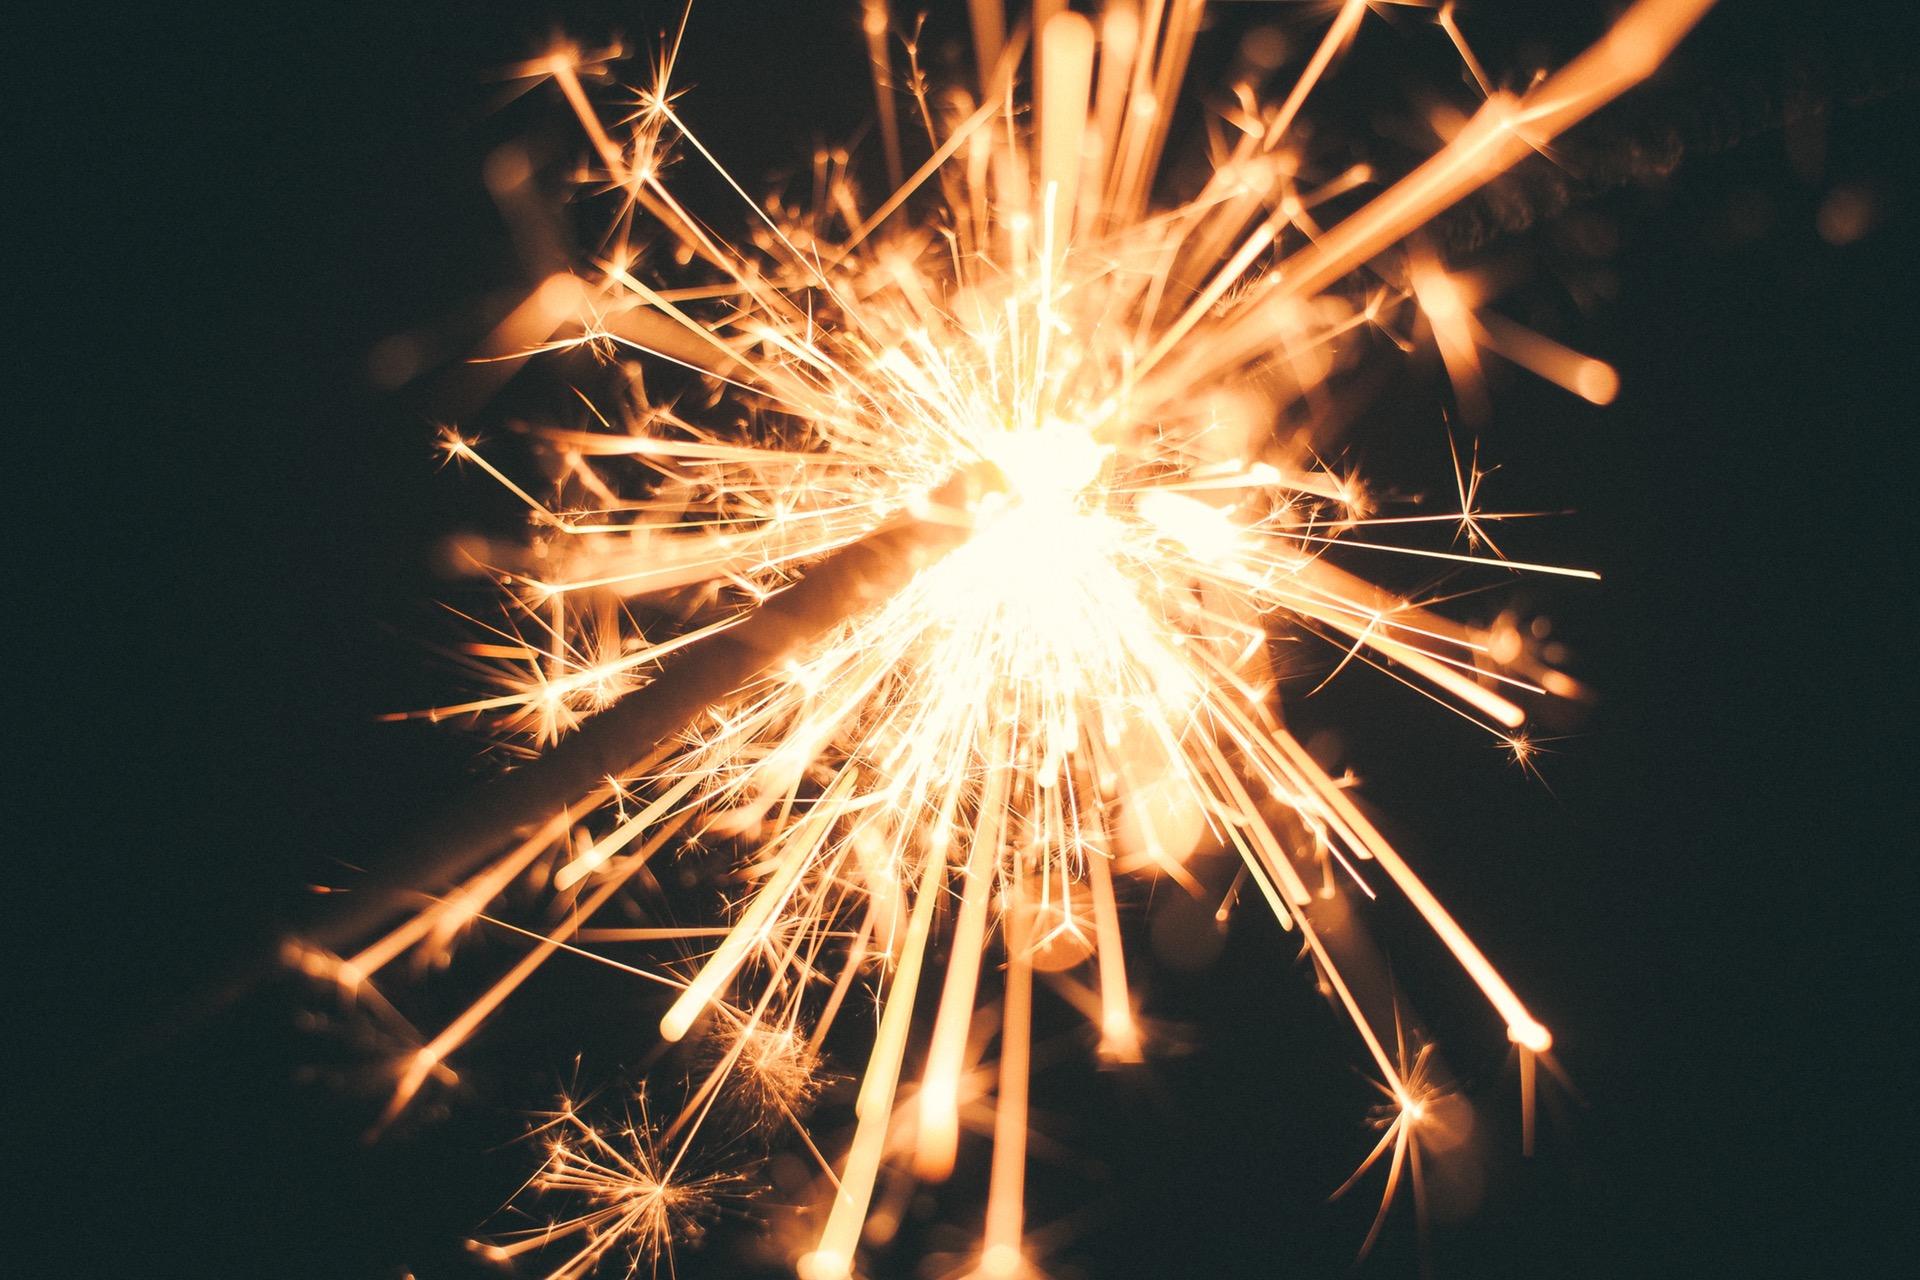 Smokeless Wedding Sparklers: Can a Sparkler Burn Without Smoke?